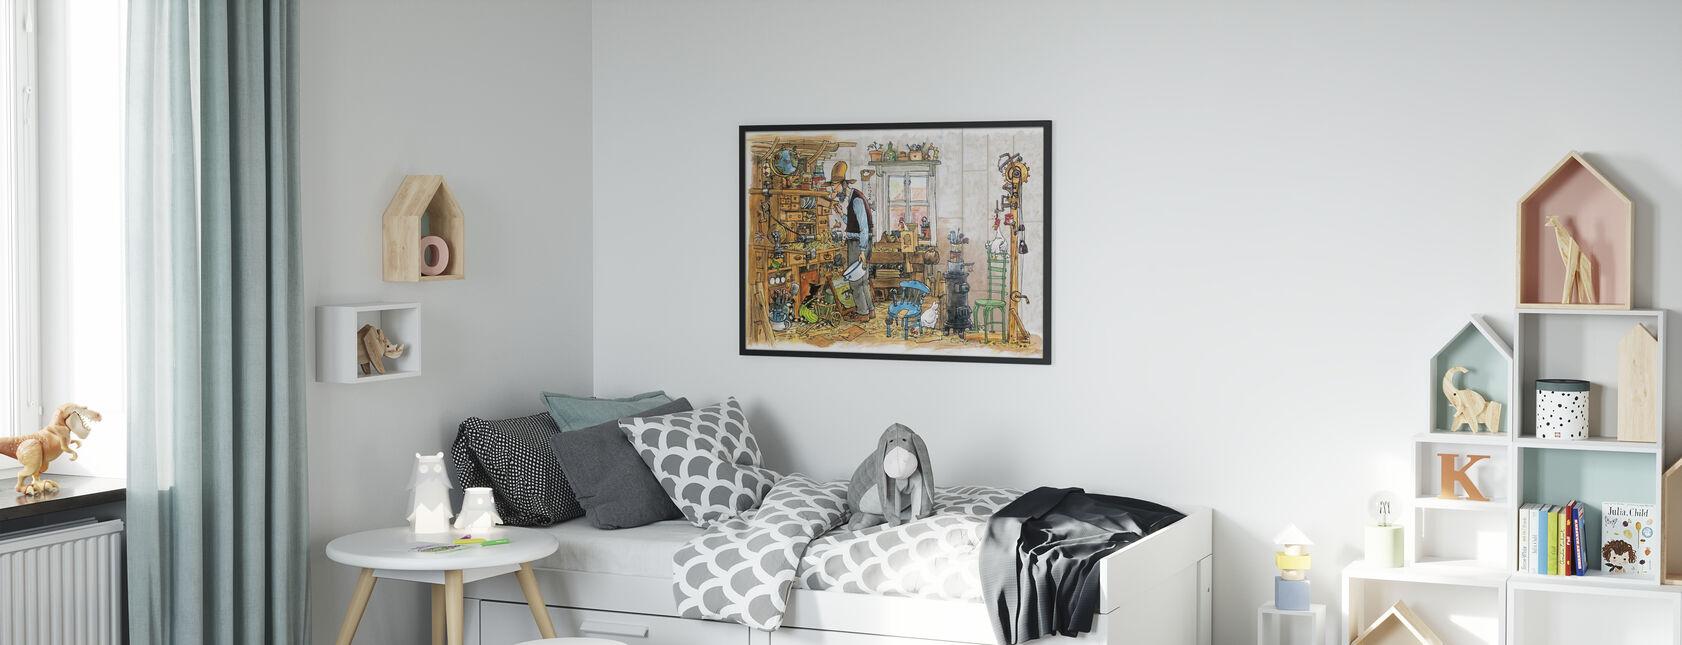 De timmerman - Poster - Kinderkamer